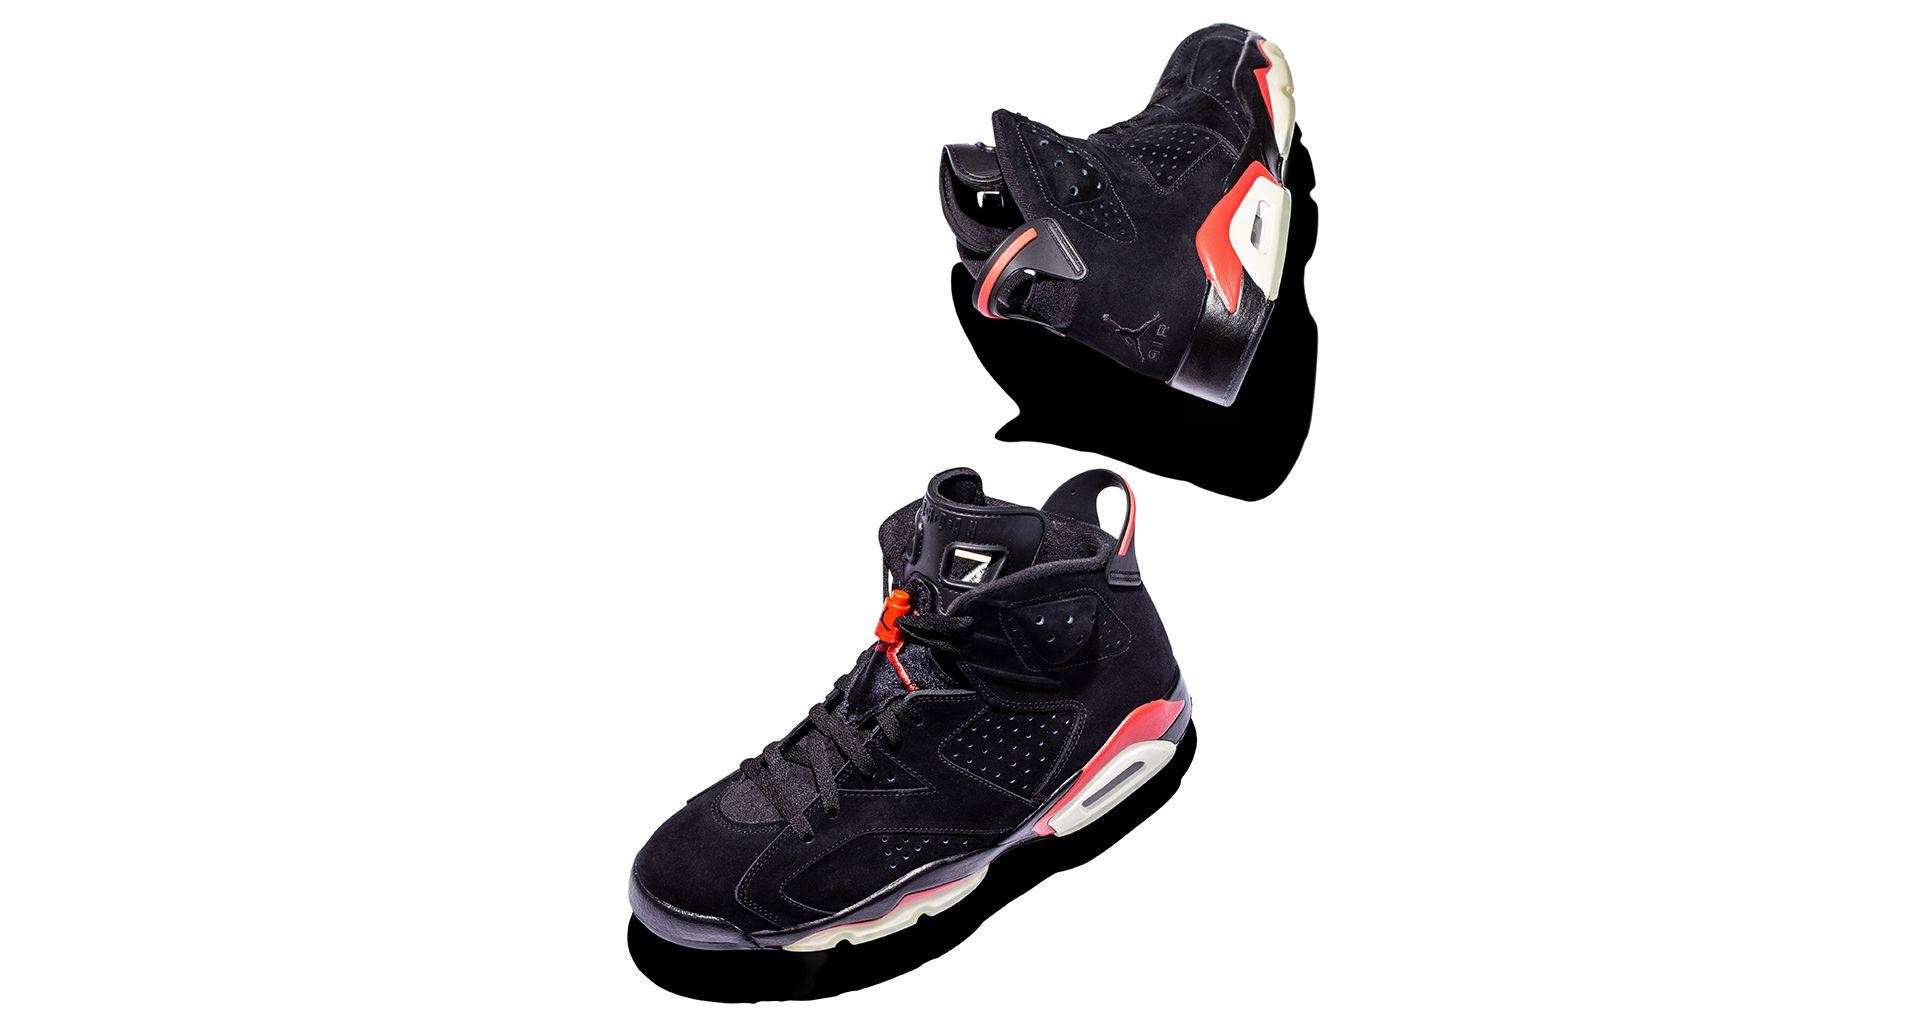 wholesale dealer 39c3e 5cf07 Inside the Vault: Air Jordan 6 Evolution. Nike+ SNKRS